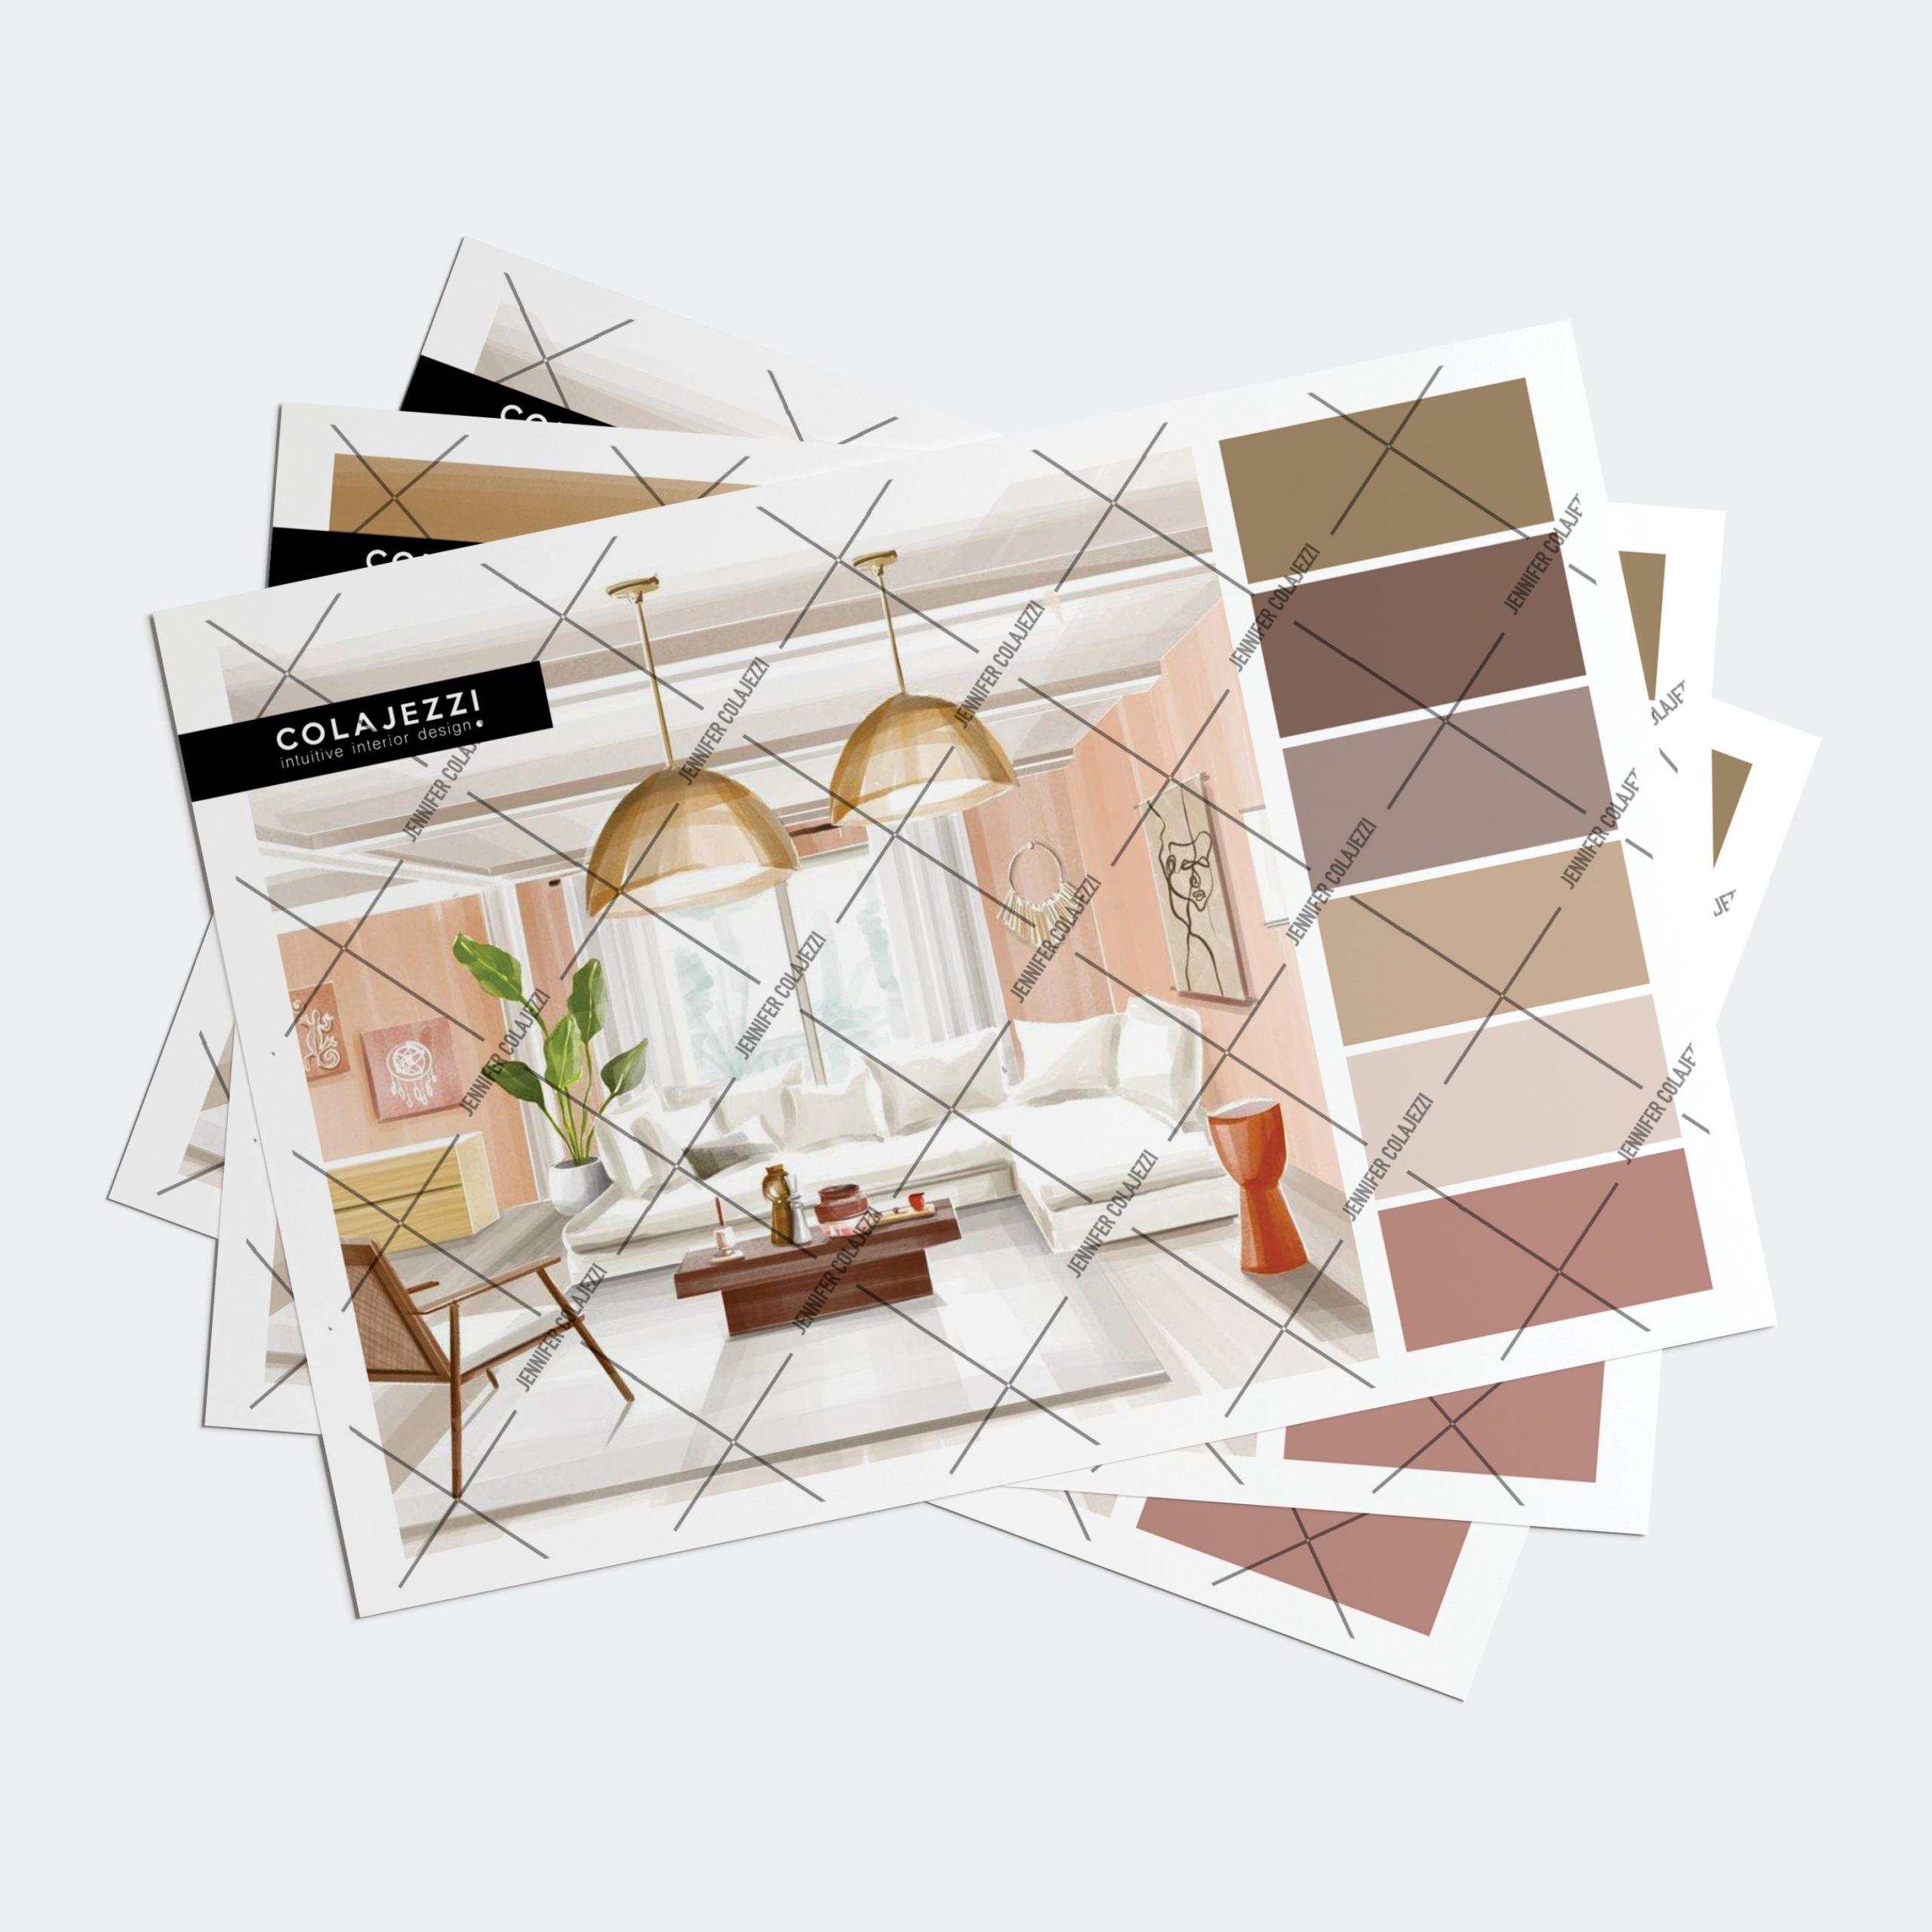 Jennifer Colajezzi - Fysiek kleurenpalet - Earth Tones